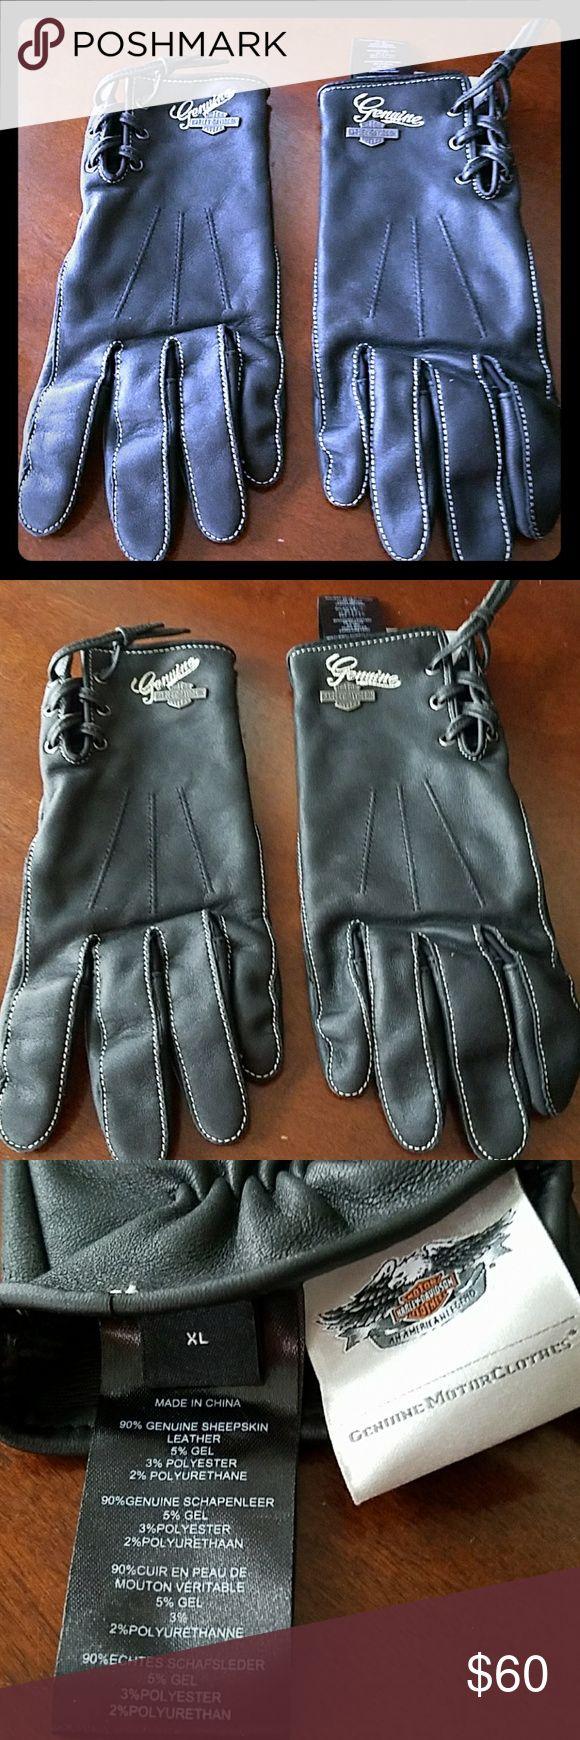 Womens black leather gloves medium - Harley Davidson Gloves Womens